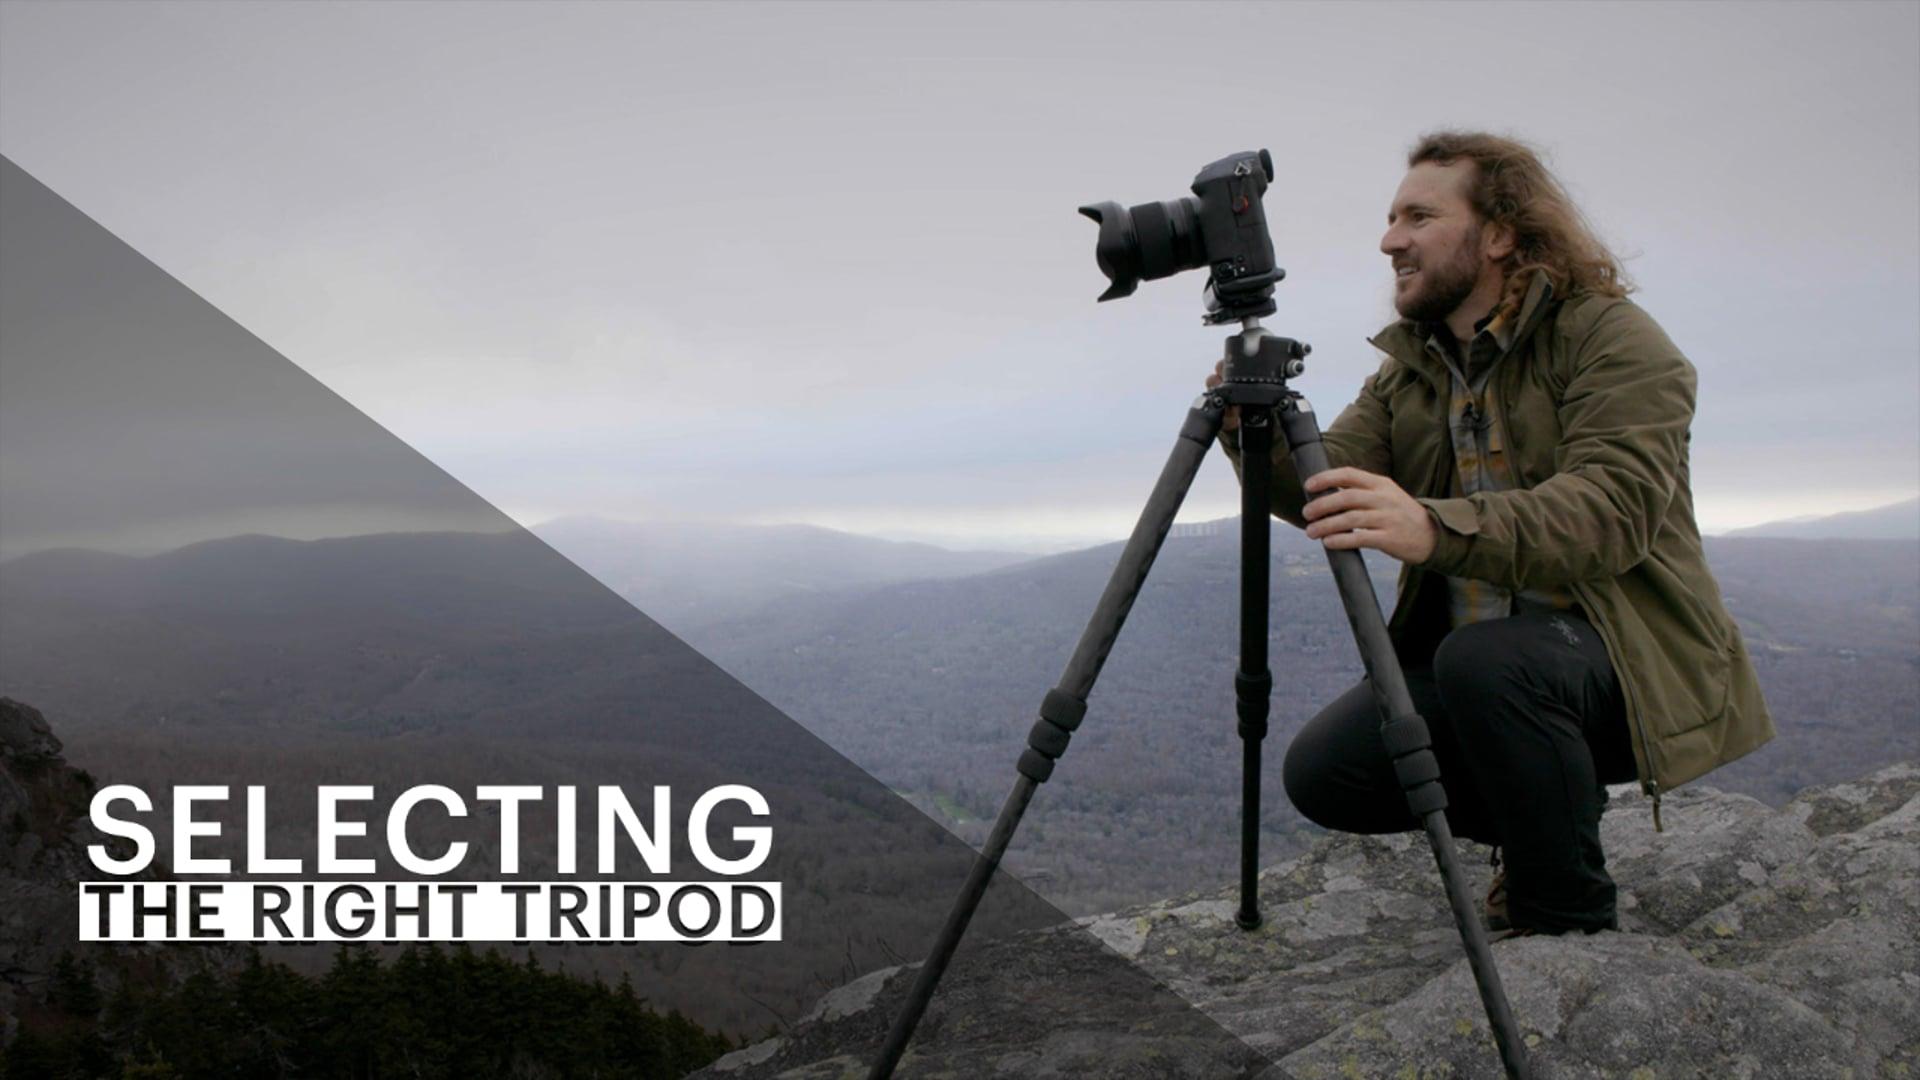 Selecting the Right Tripod - vimeo